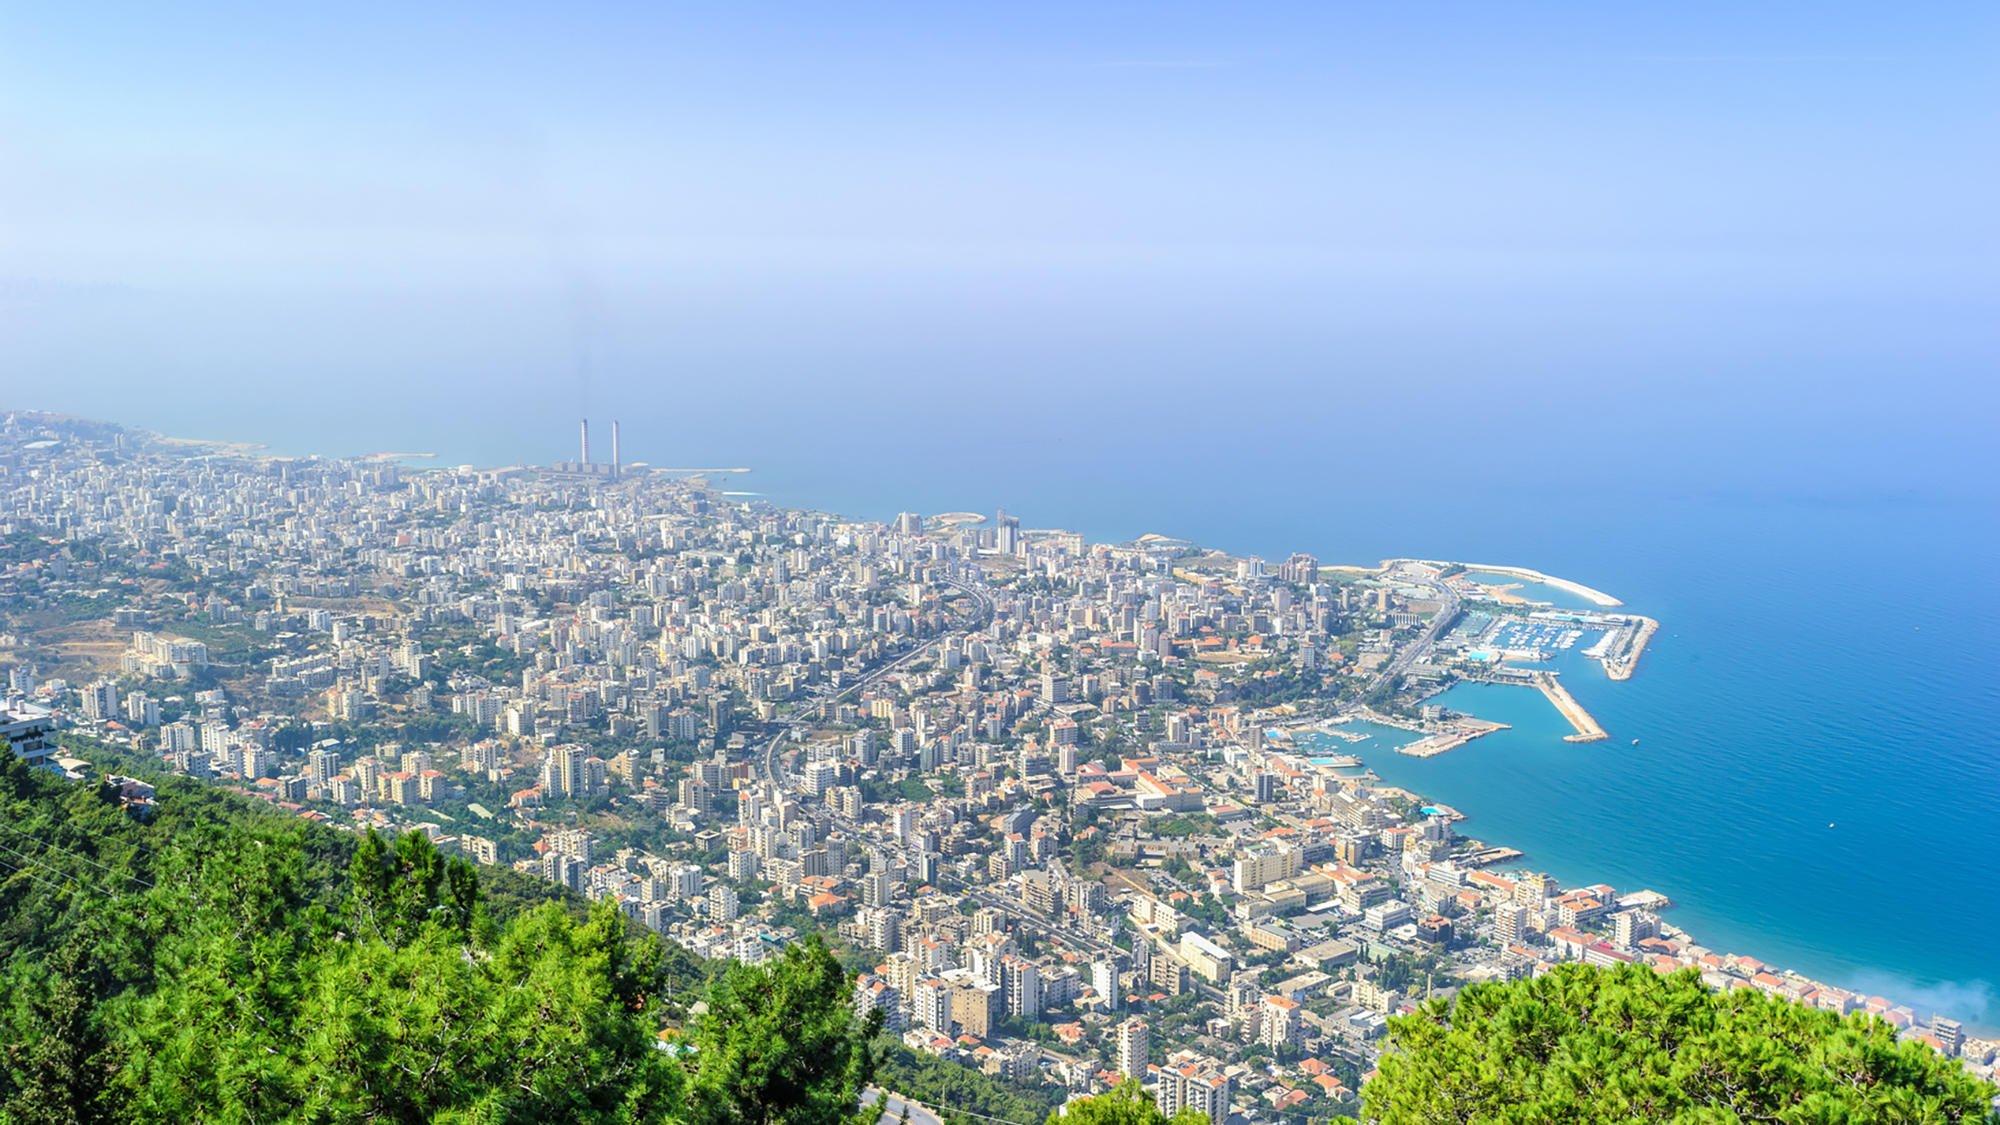 Beirut_aerial view